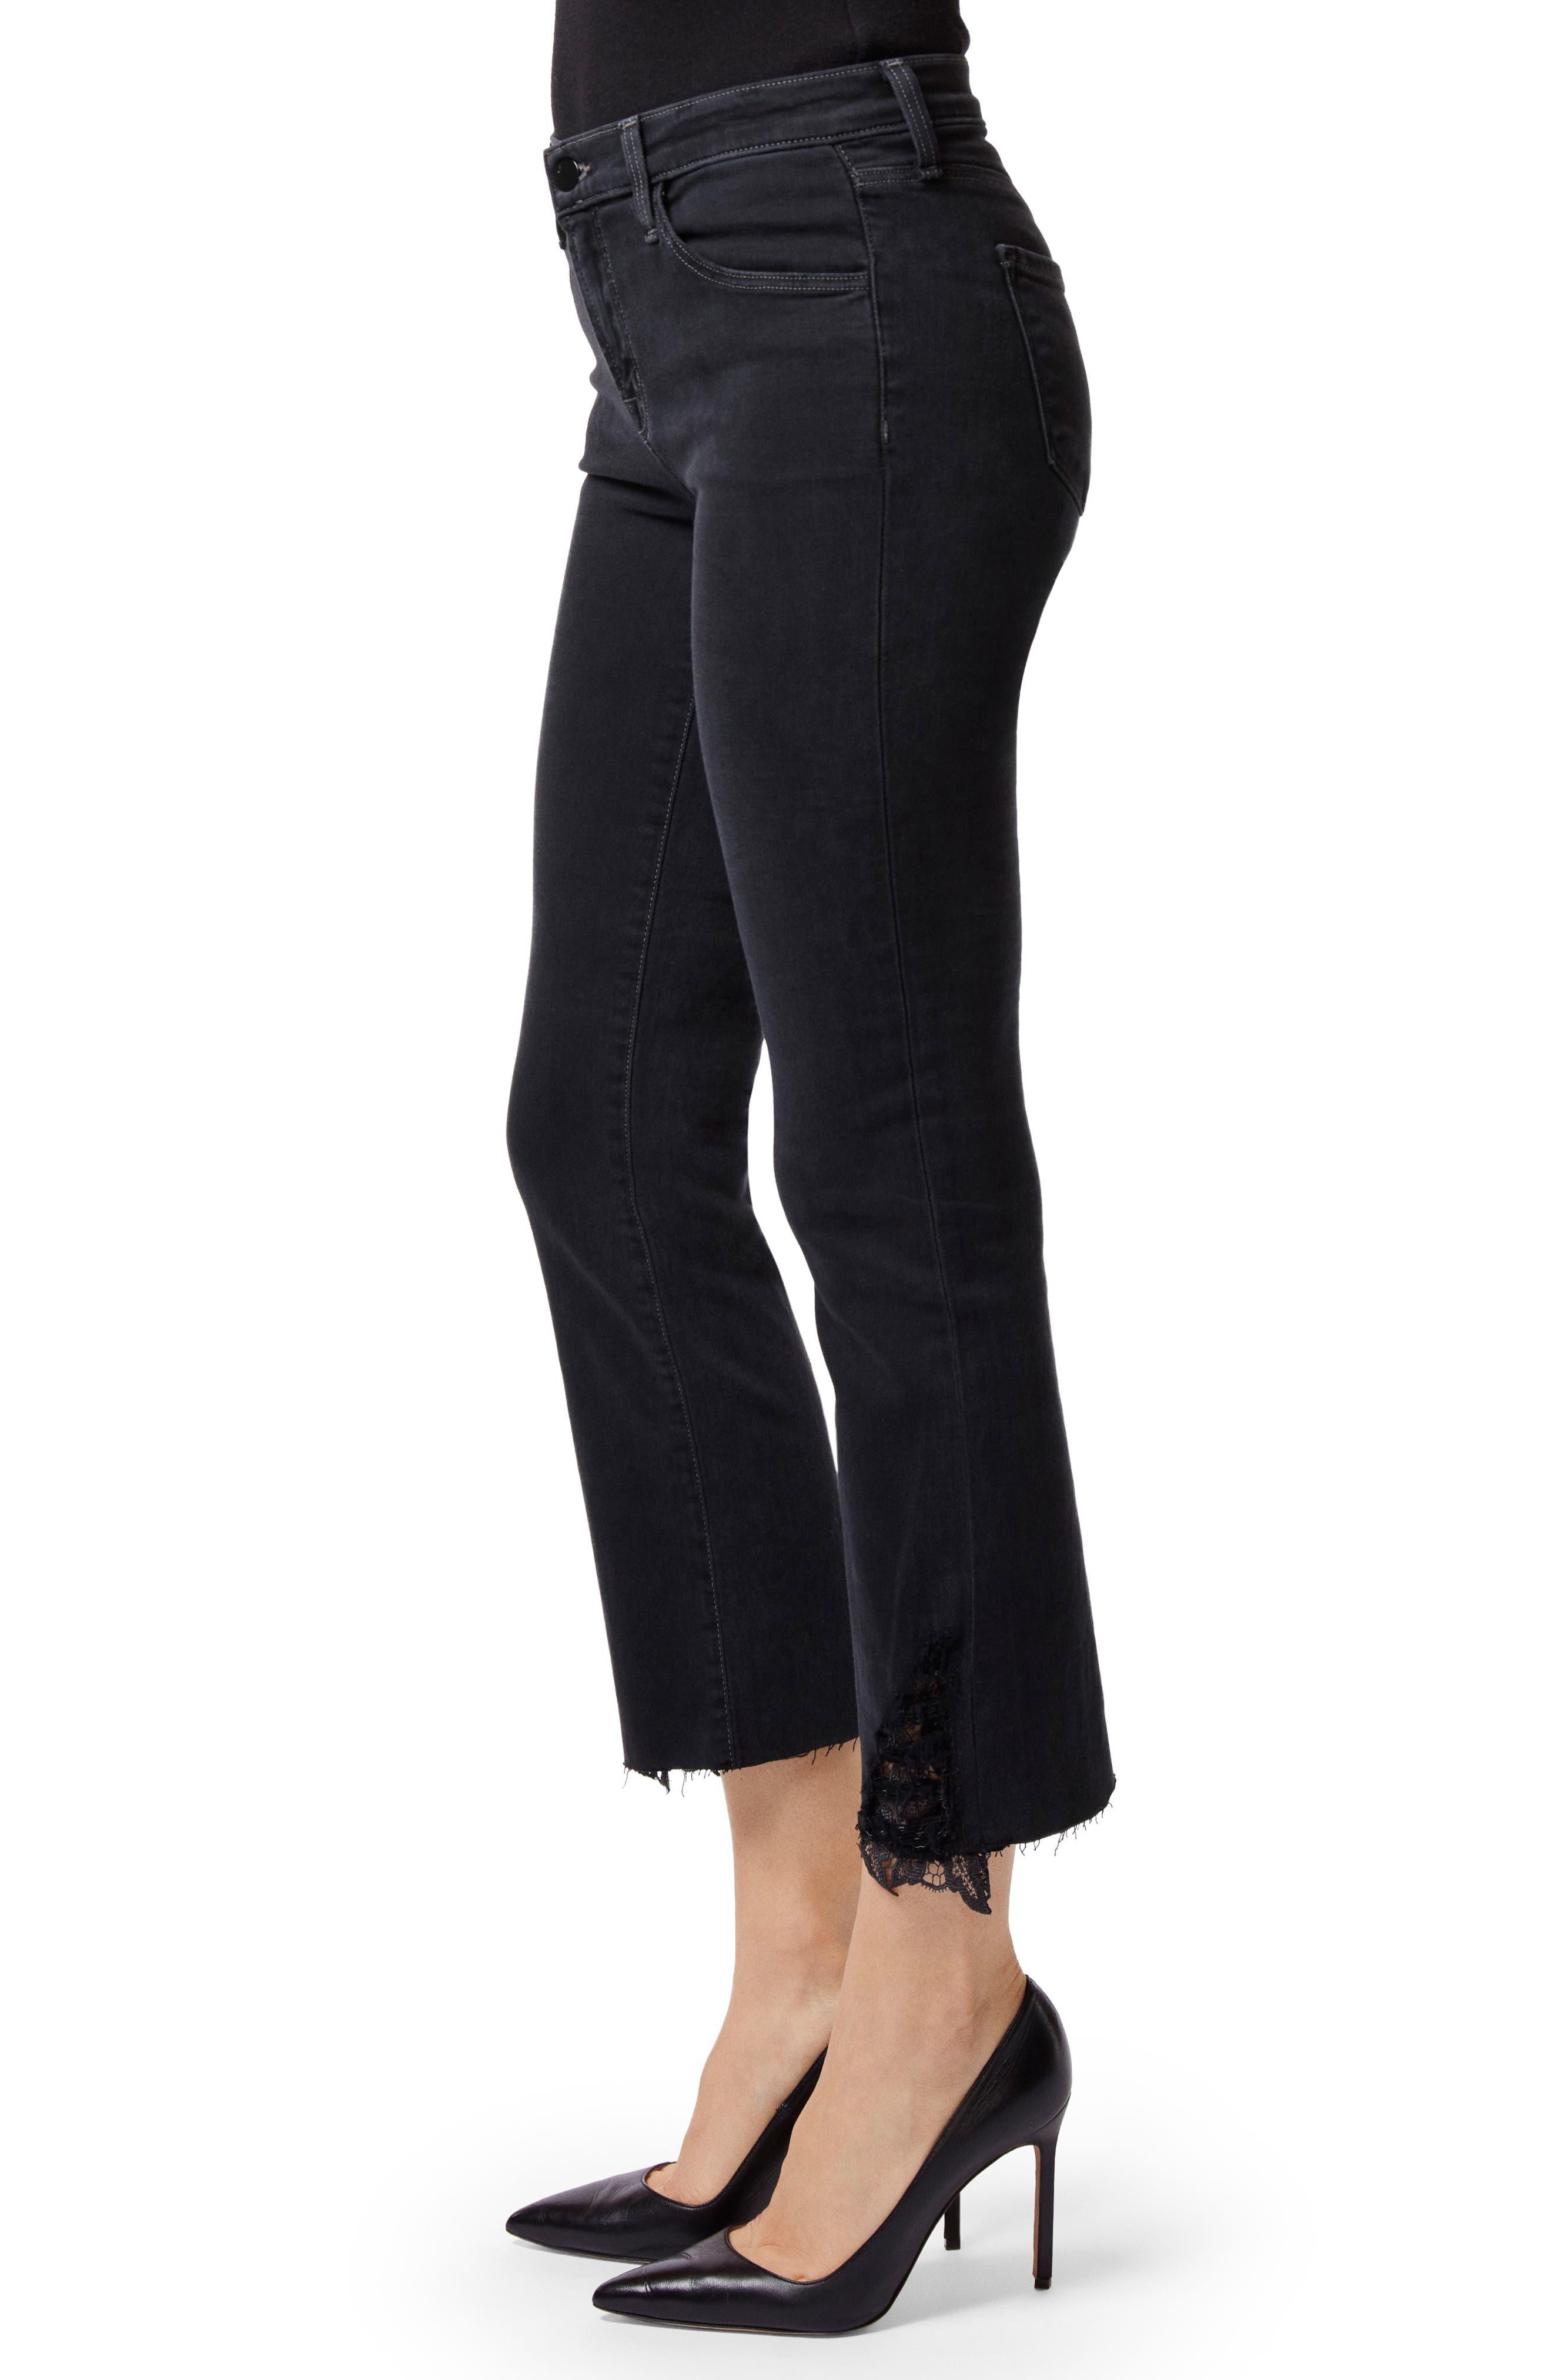 J BRAND,                             Selena Crop Bootcut Jeans,                             Alternate thumbnail 3, color,                             001